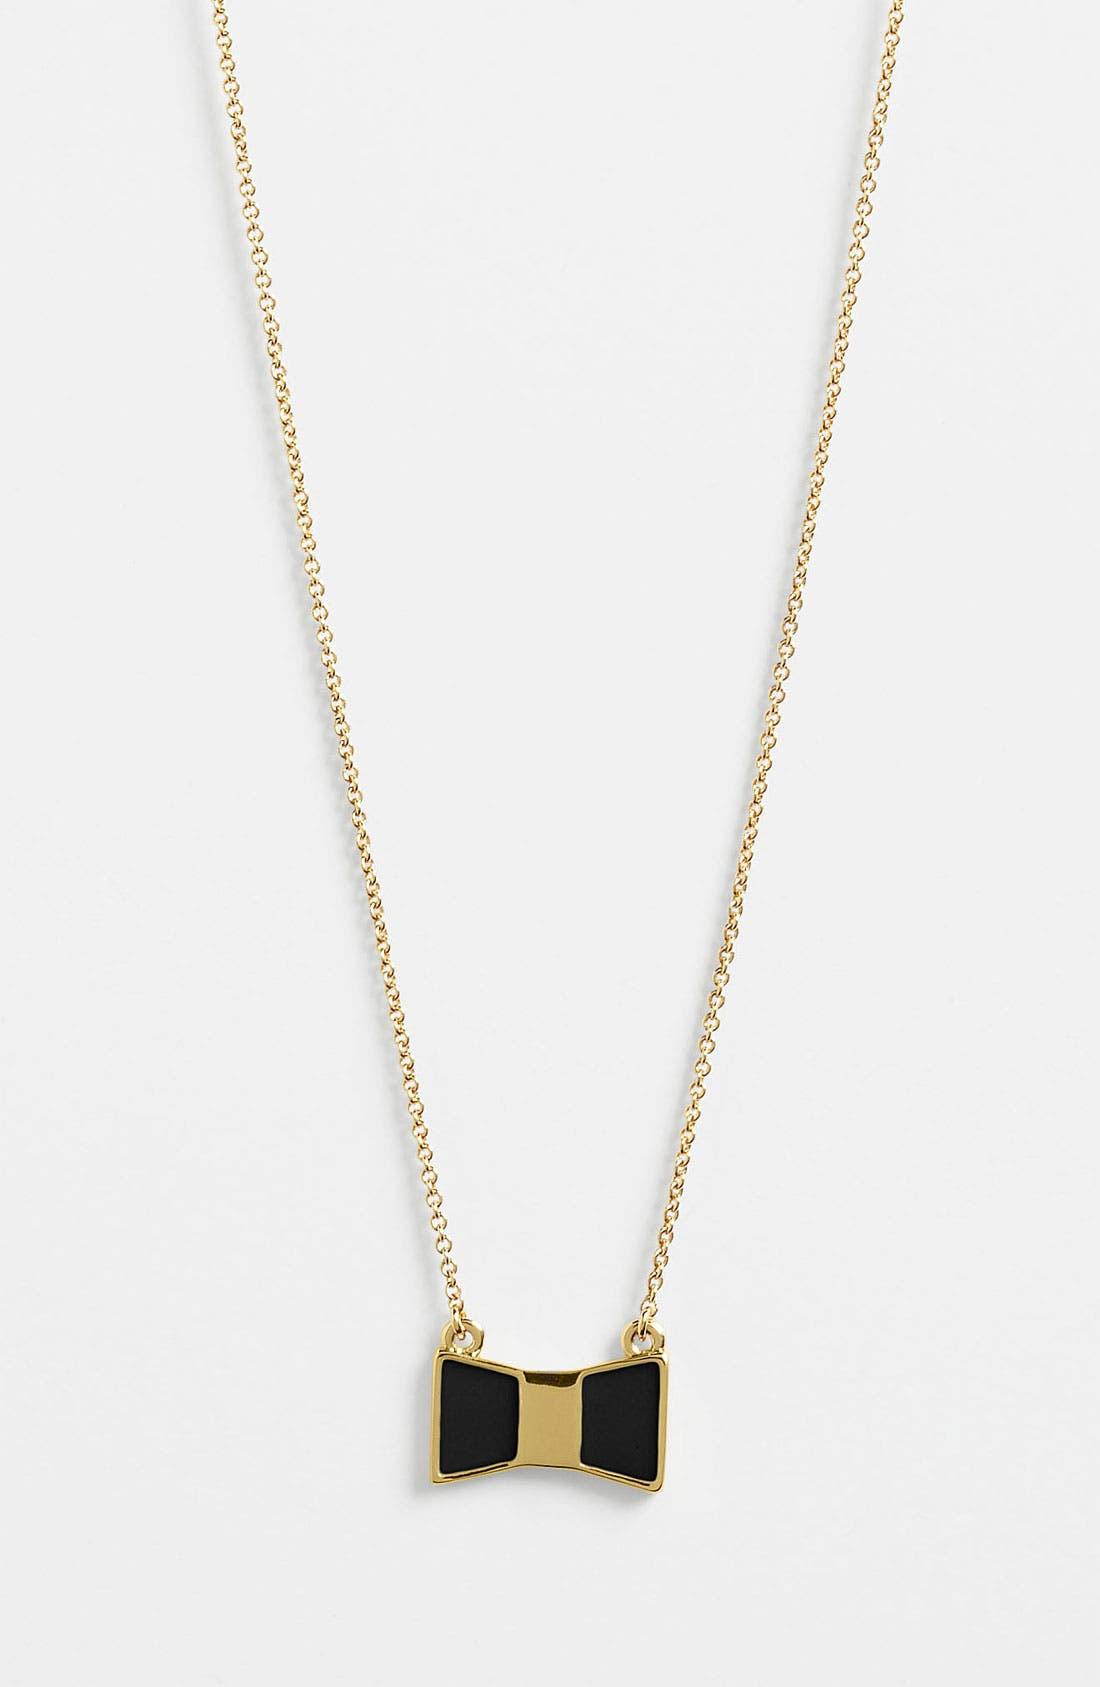 Main Image - kate spade new york 'bow shoppe' pendant necklace